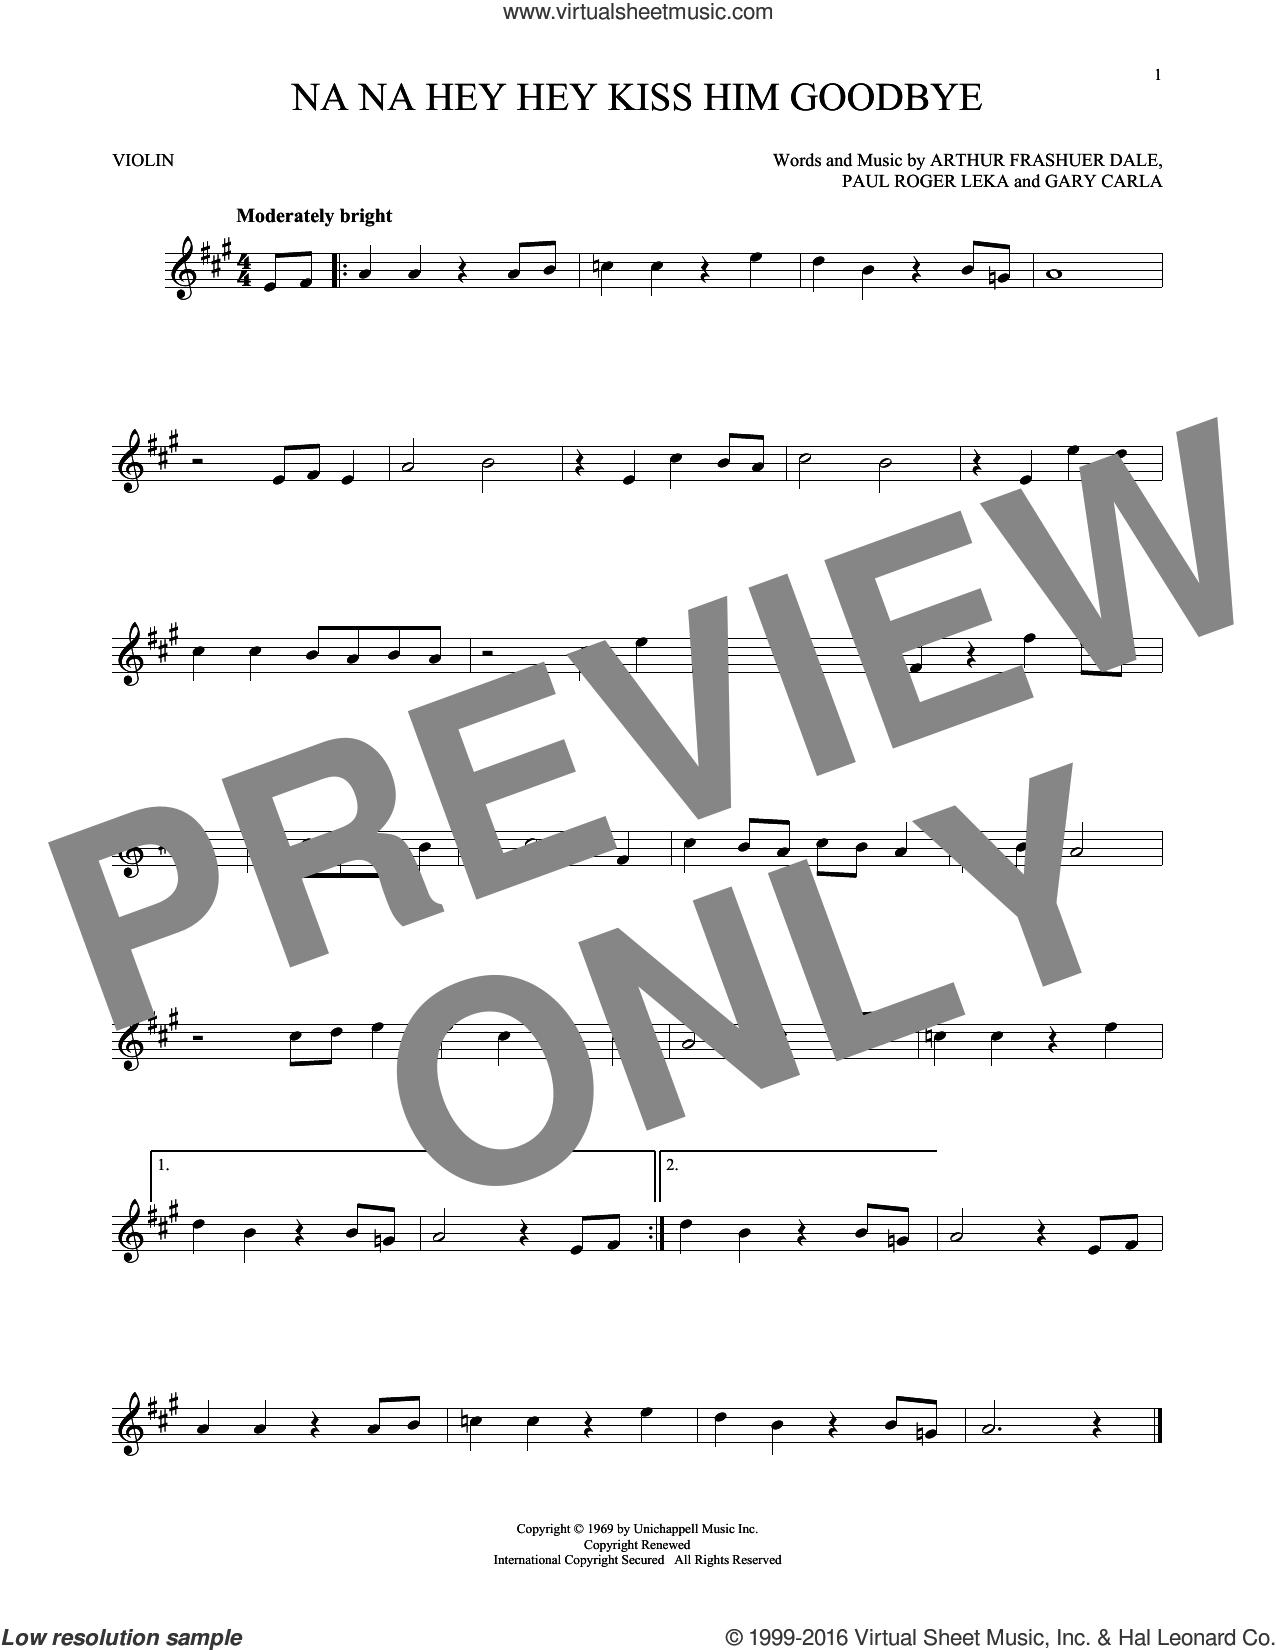 Na Na Hey Hey Kiss Him Goodbye sheet music for violin solo by Steam, Dale Frashuer, Gary De Carlo and Paul Leka, intermediate skill level